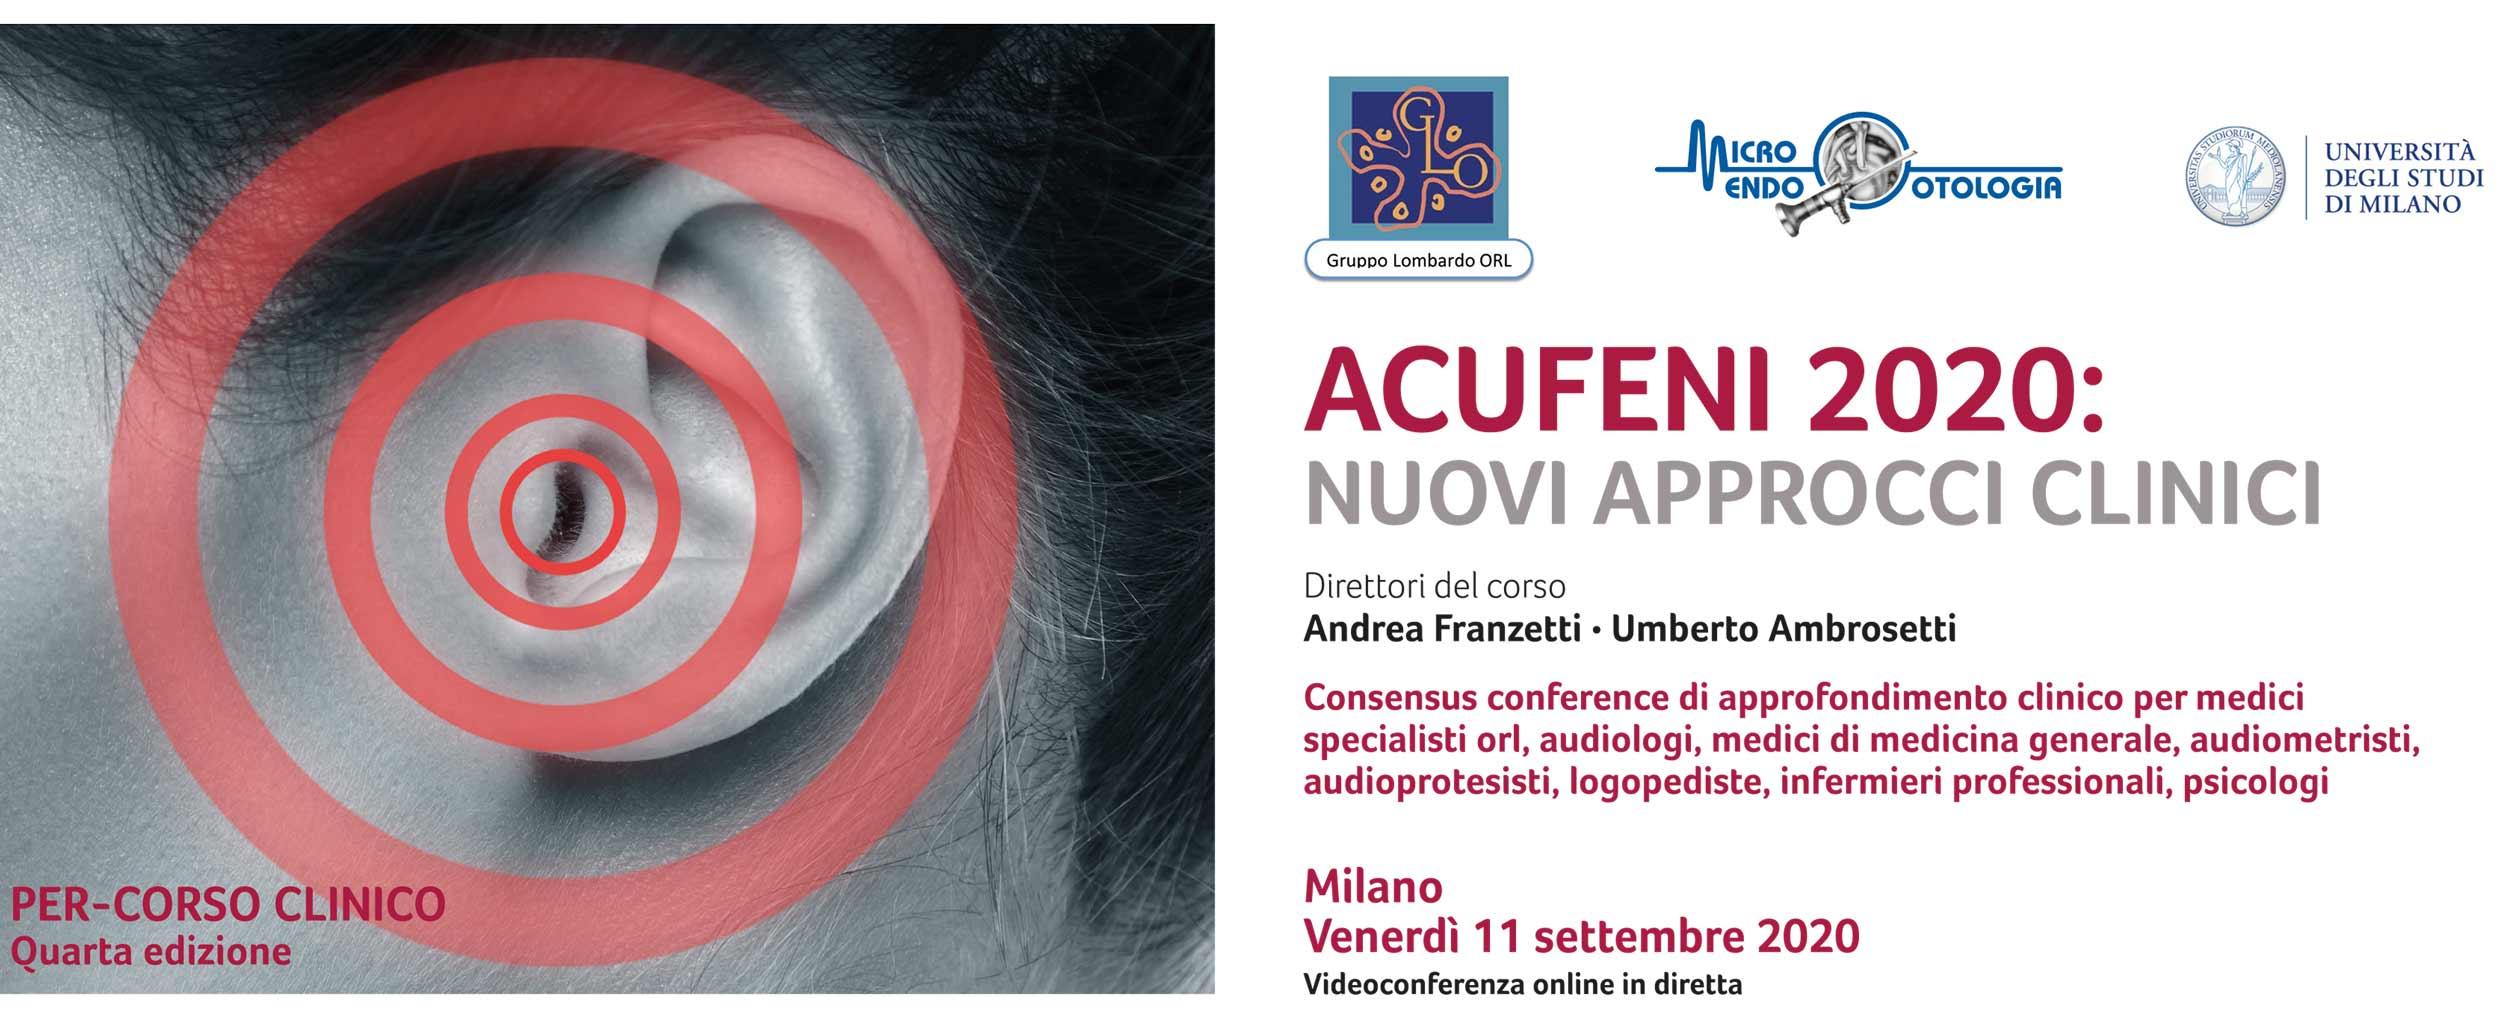 acufeni_2020_trattoblu